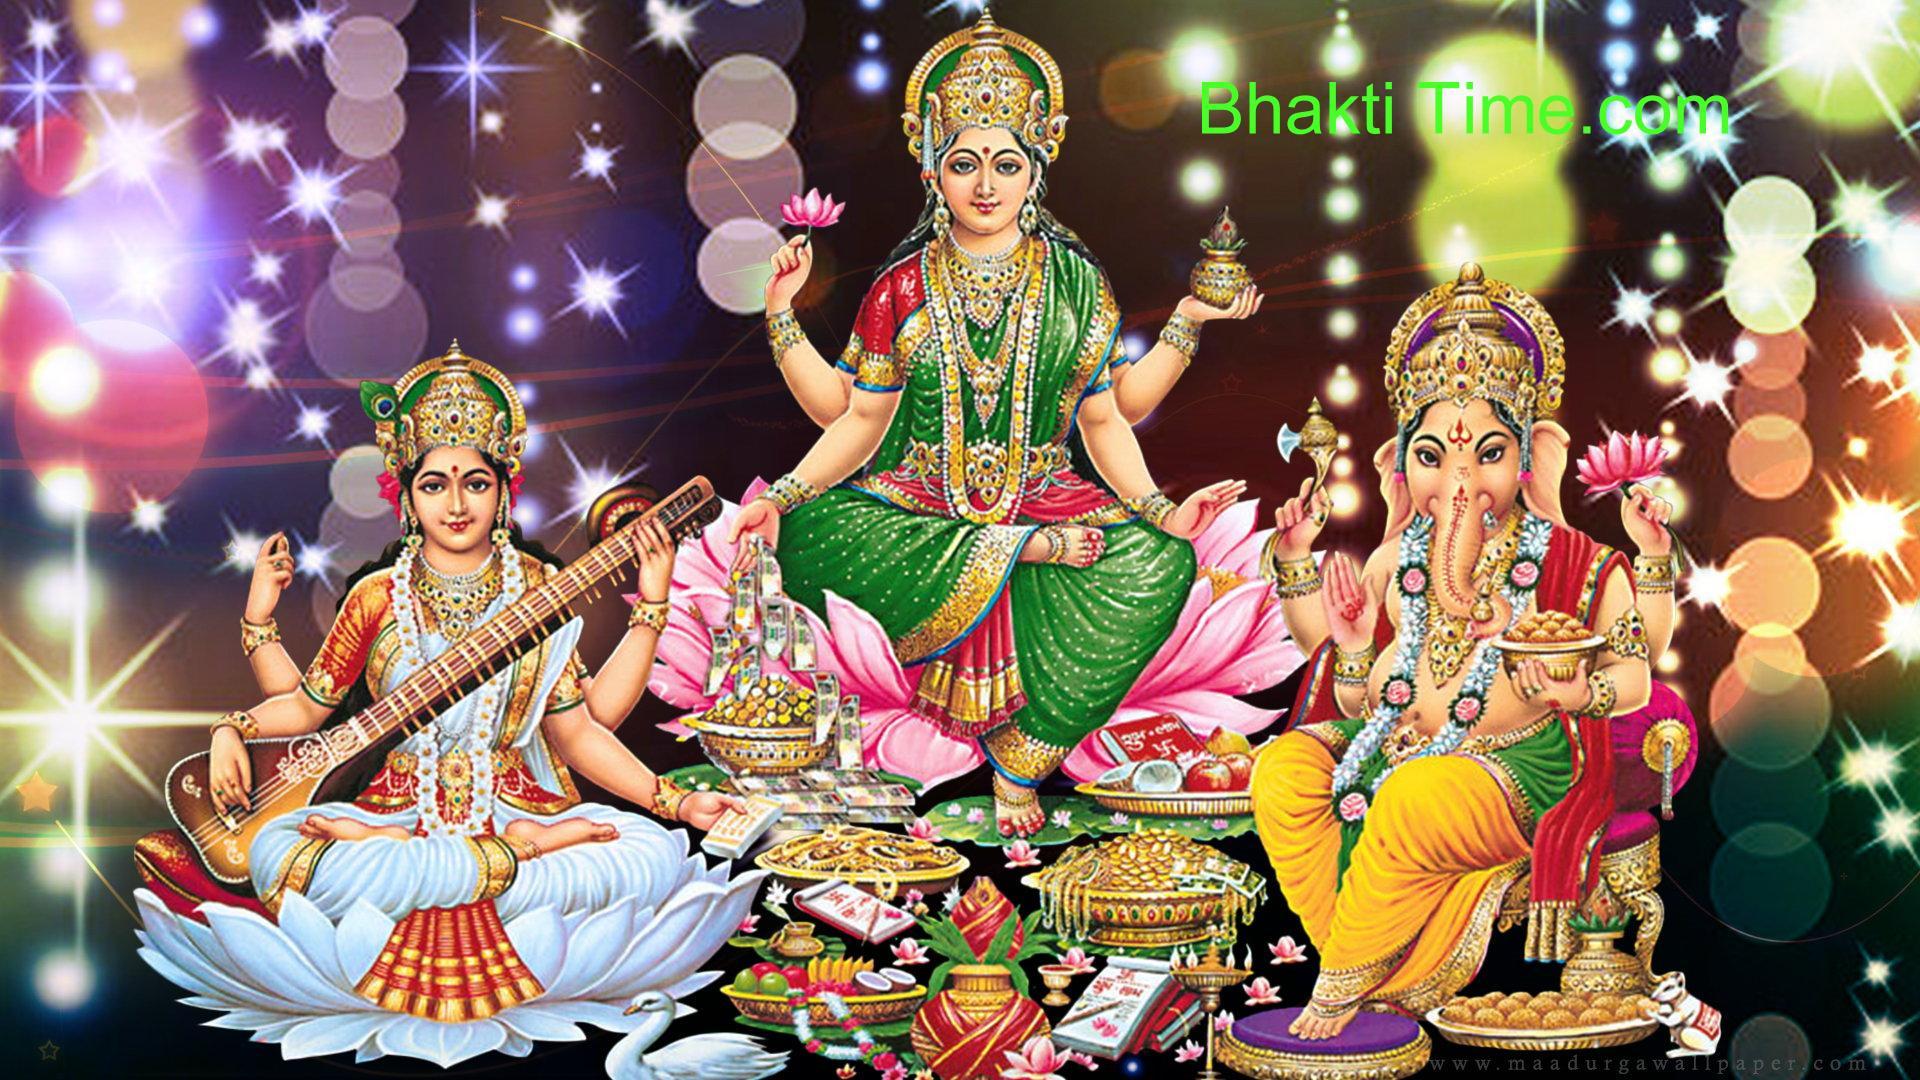 lakshmi devi wallpaper 2